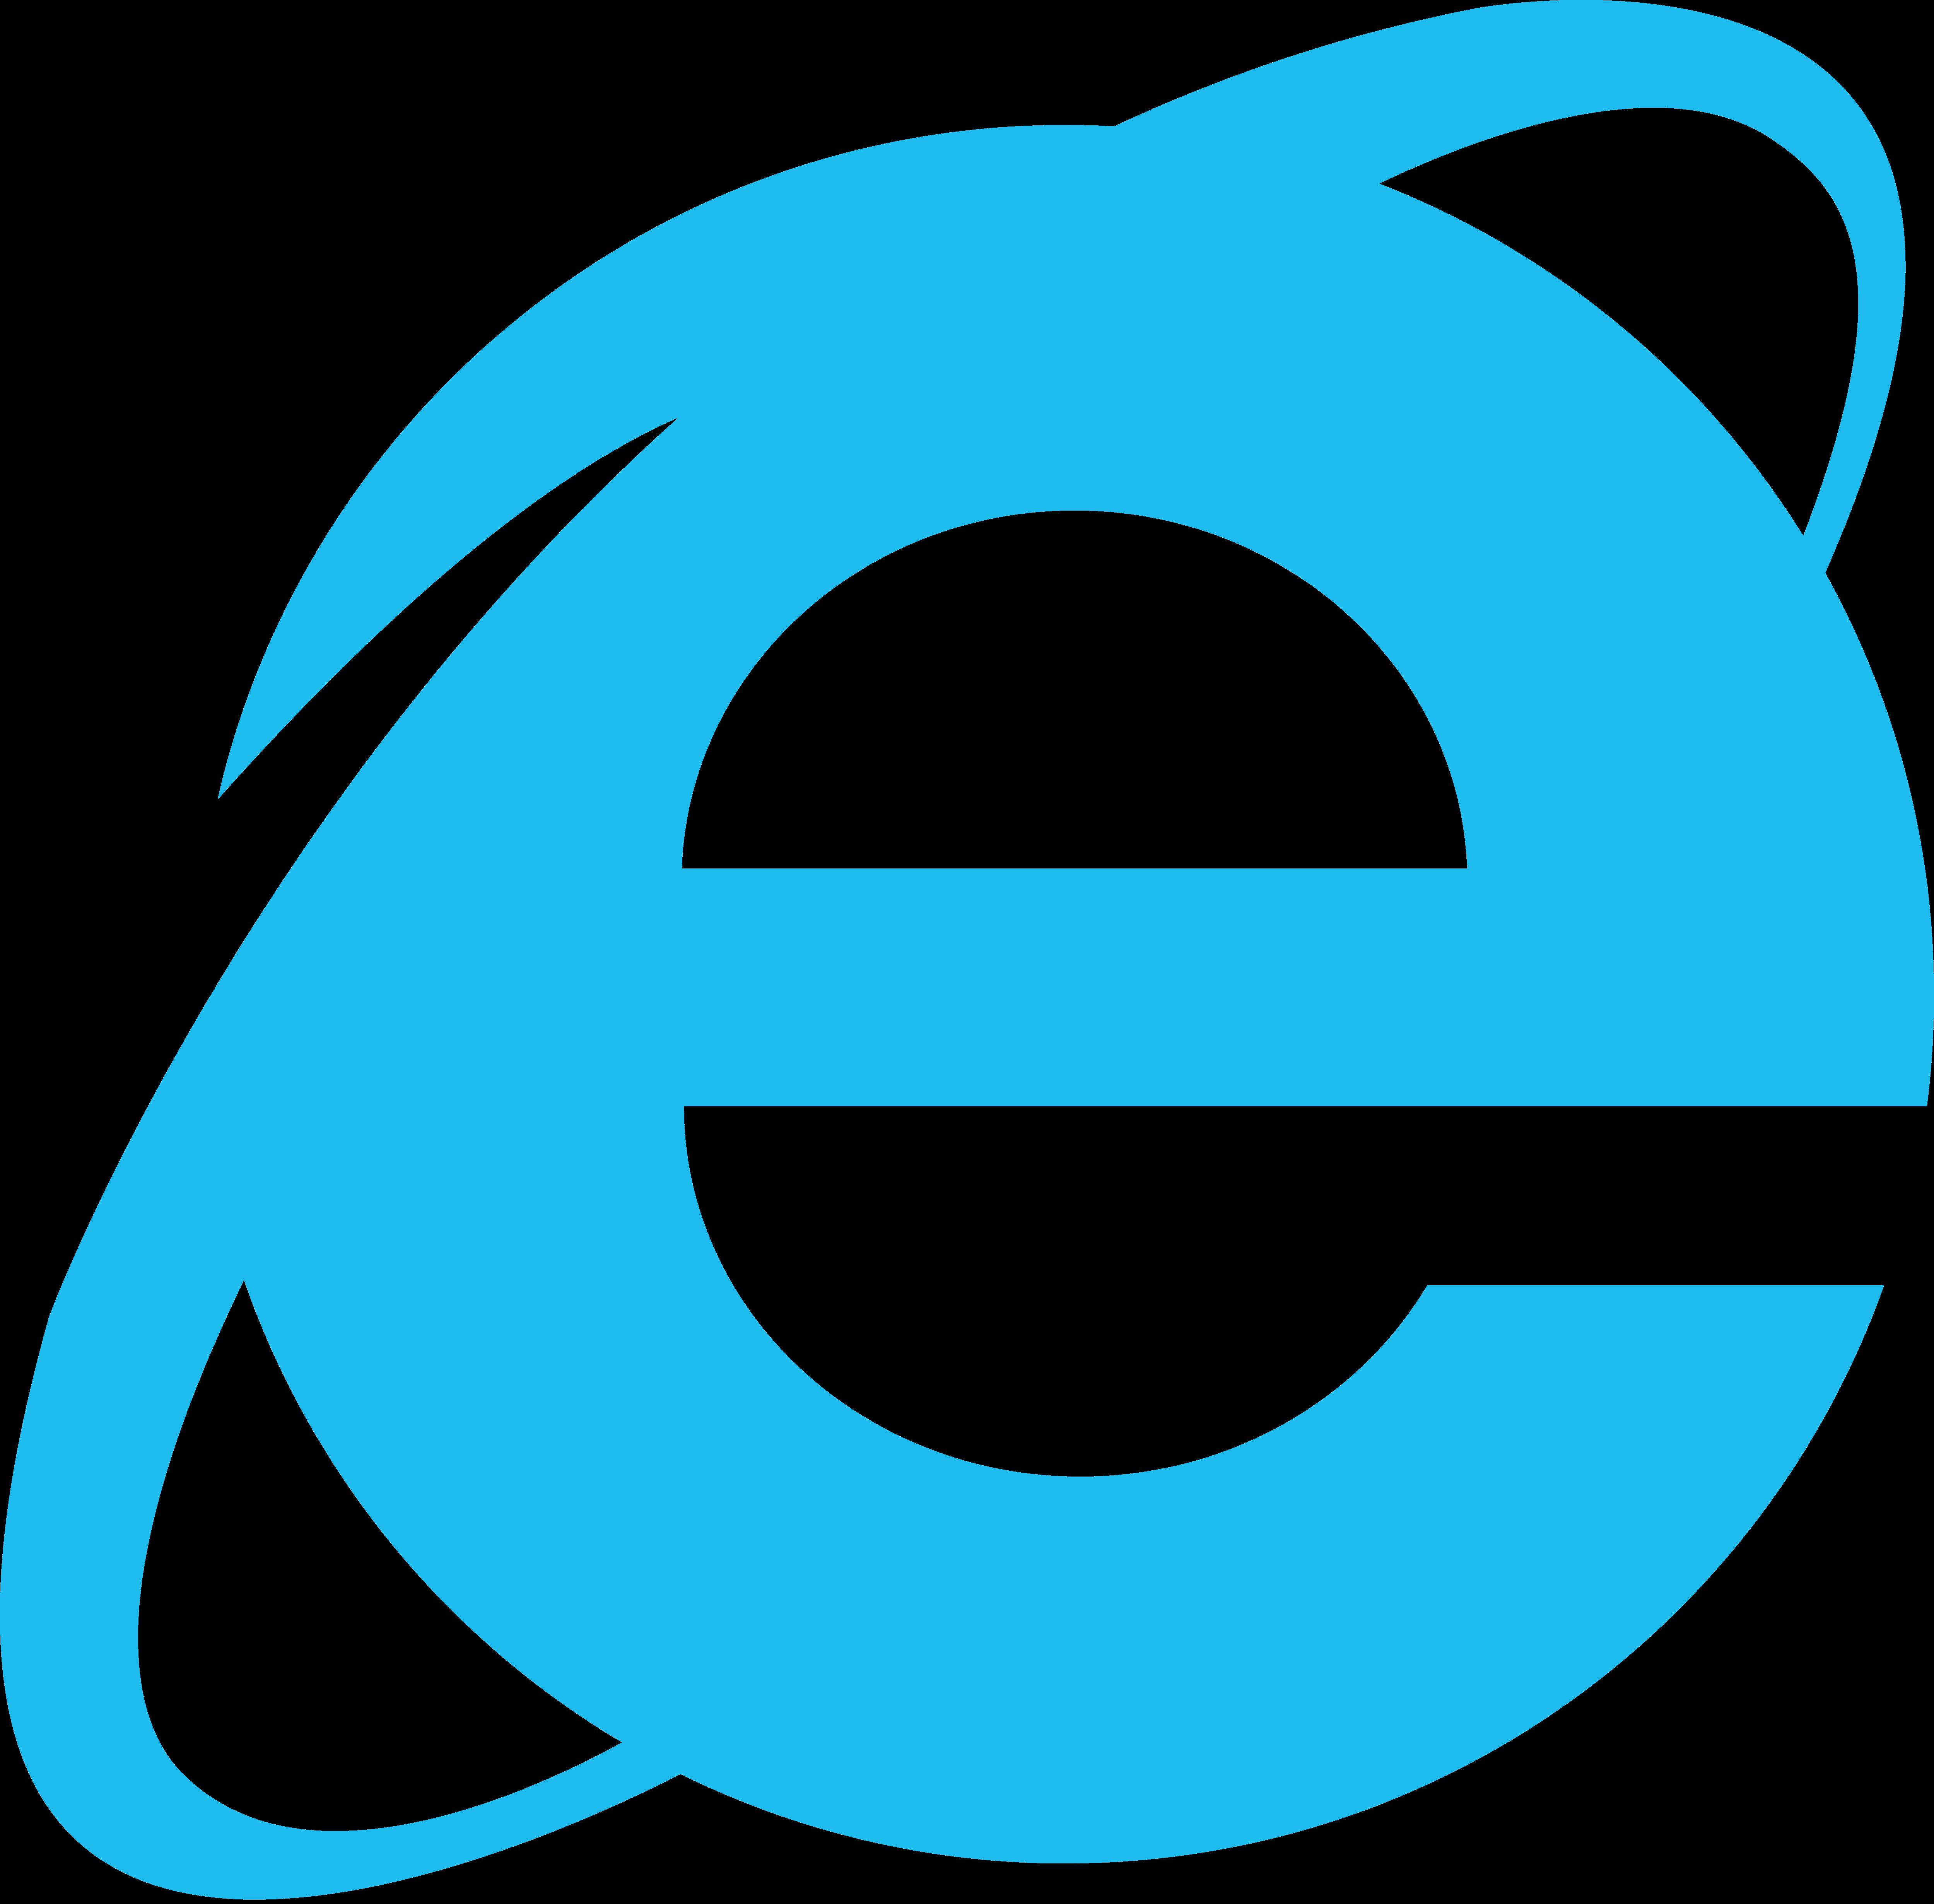 Explorer clipart discovered. Logos internet download